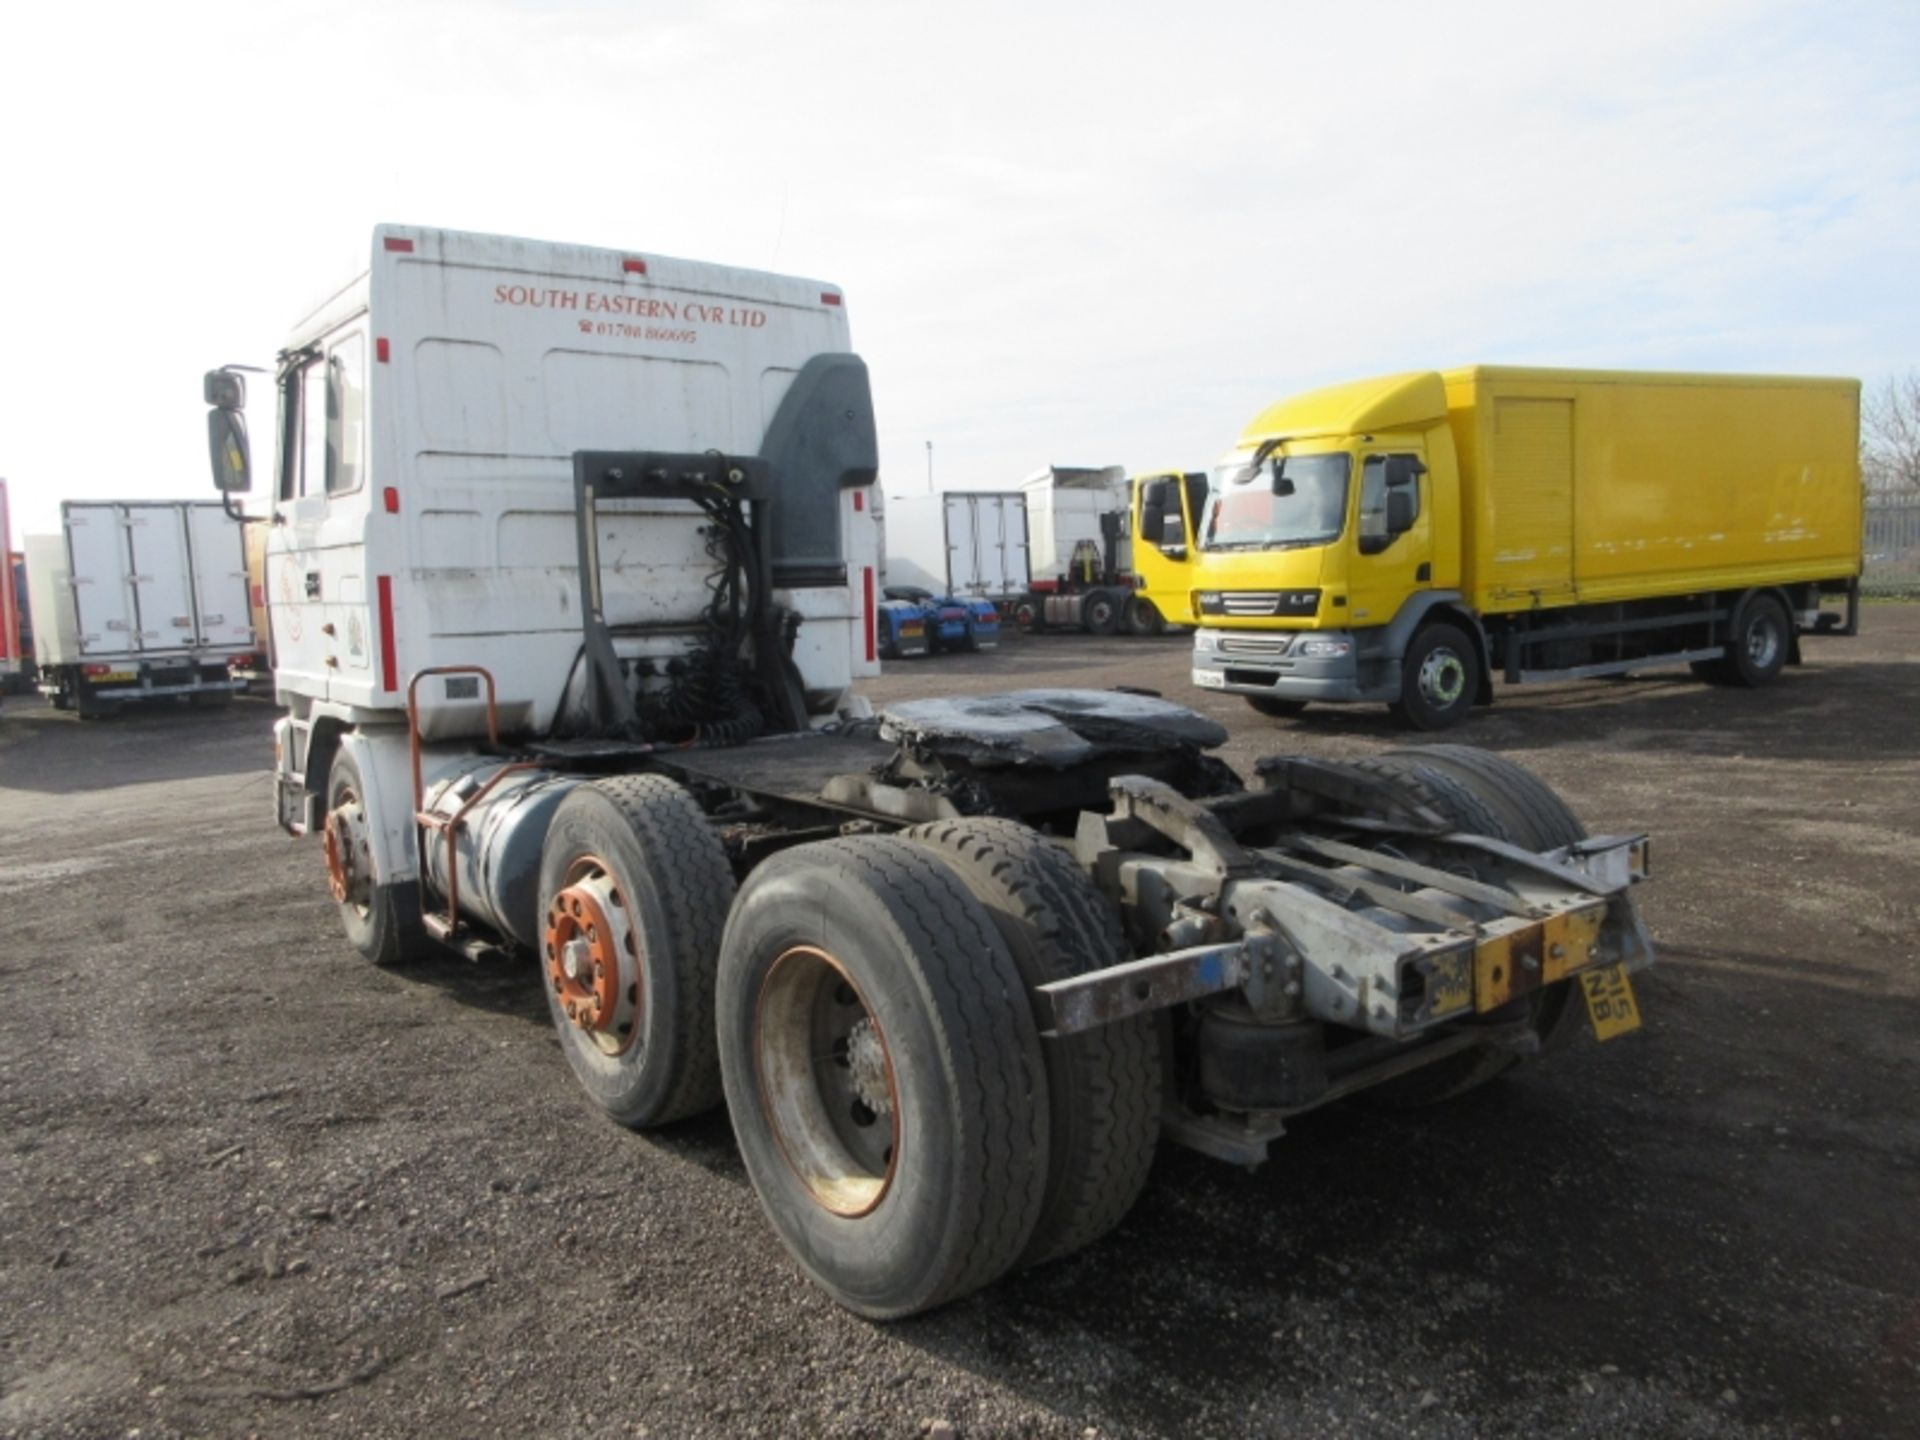 Lot 20 - FODEN 4325 Sleeper Cab Diesel - VIN: 450430 - Year: 1996 - 022,000 km - 6x2 Unit, Tipping Gear **NON